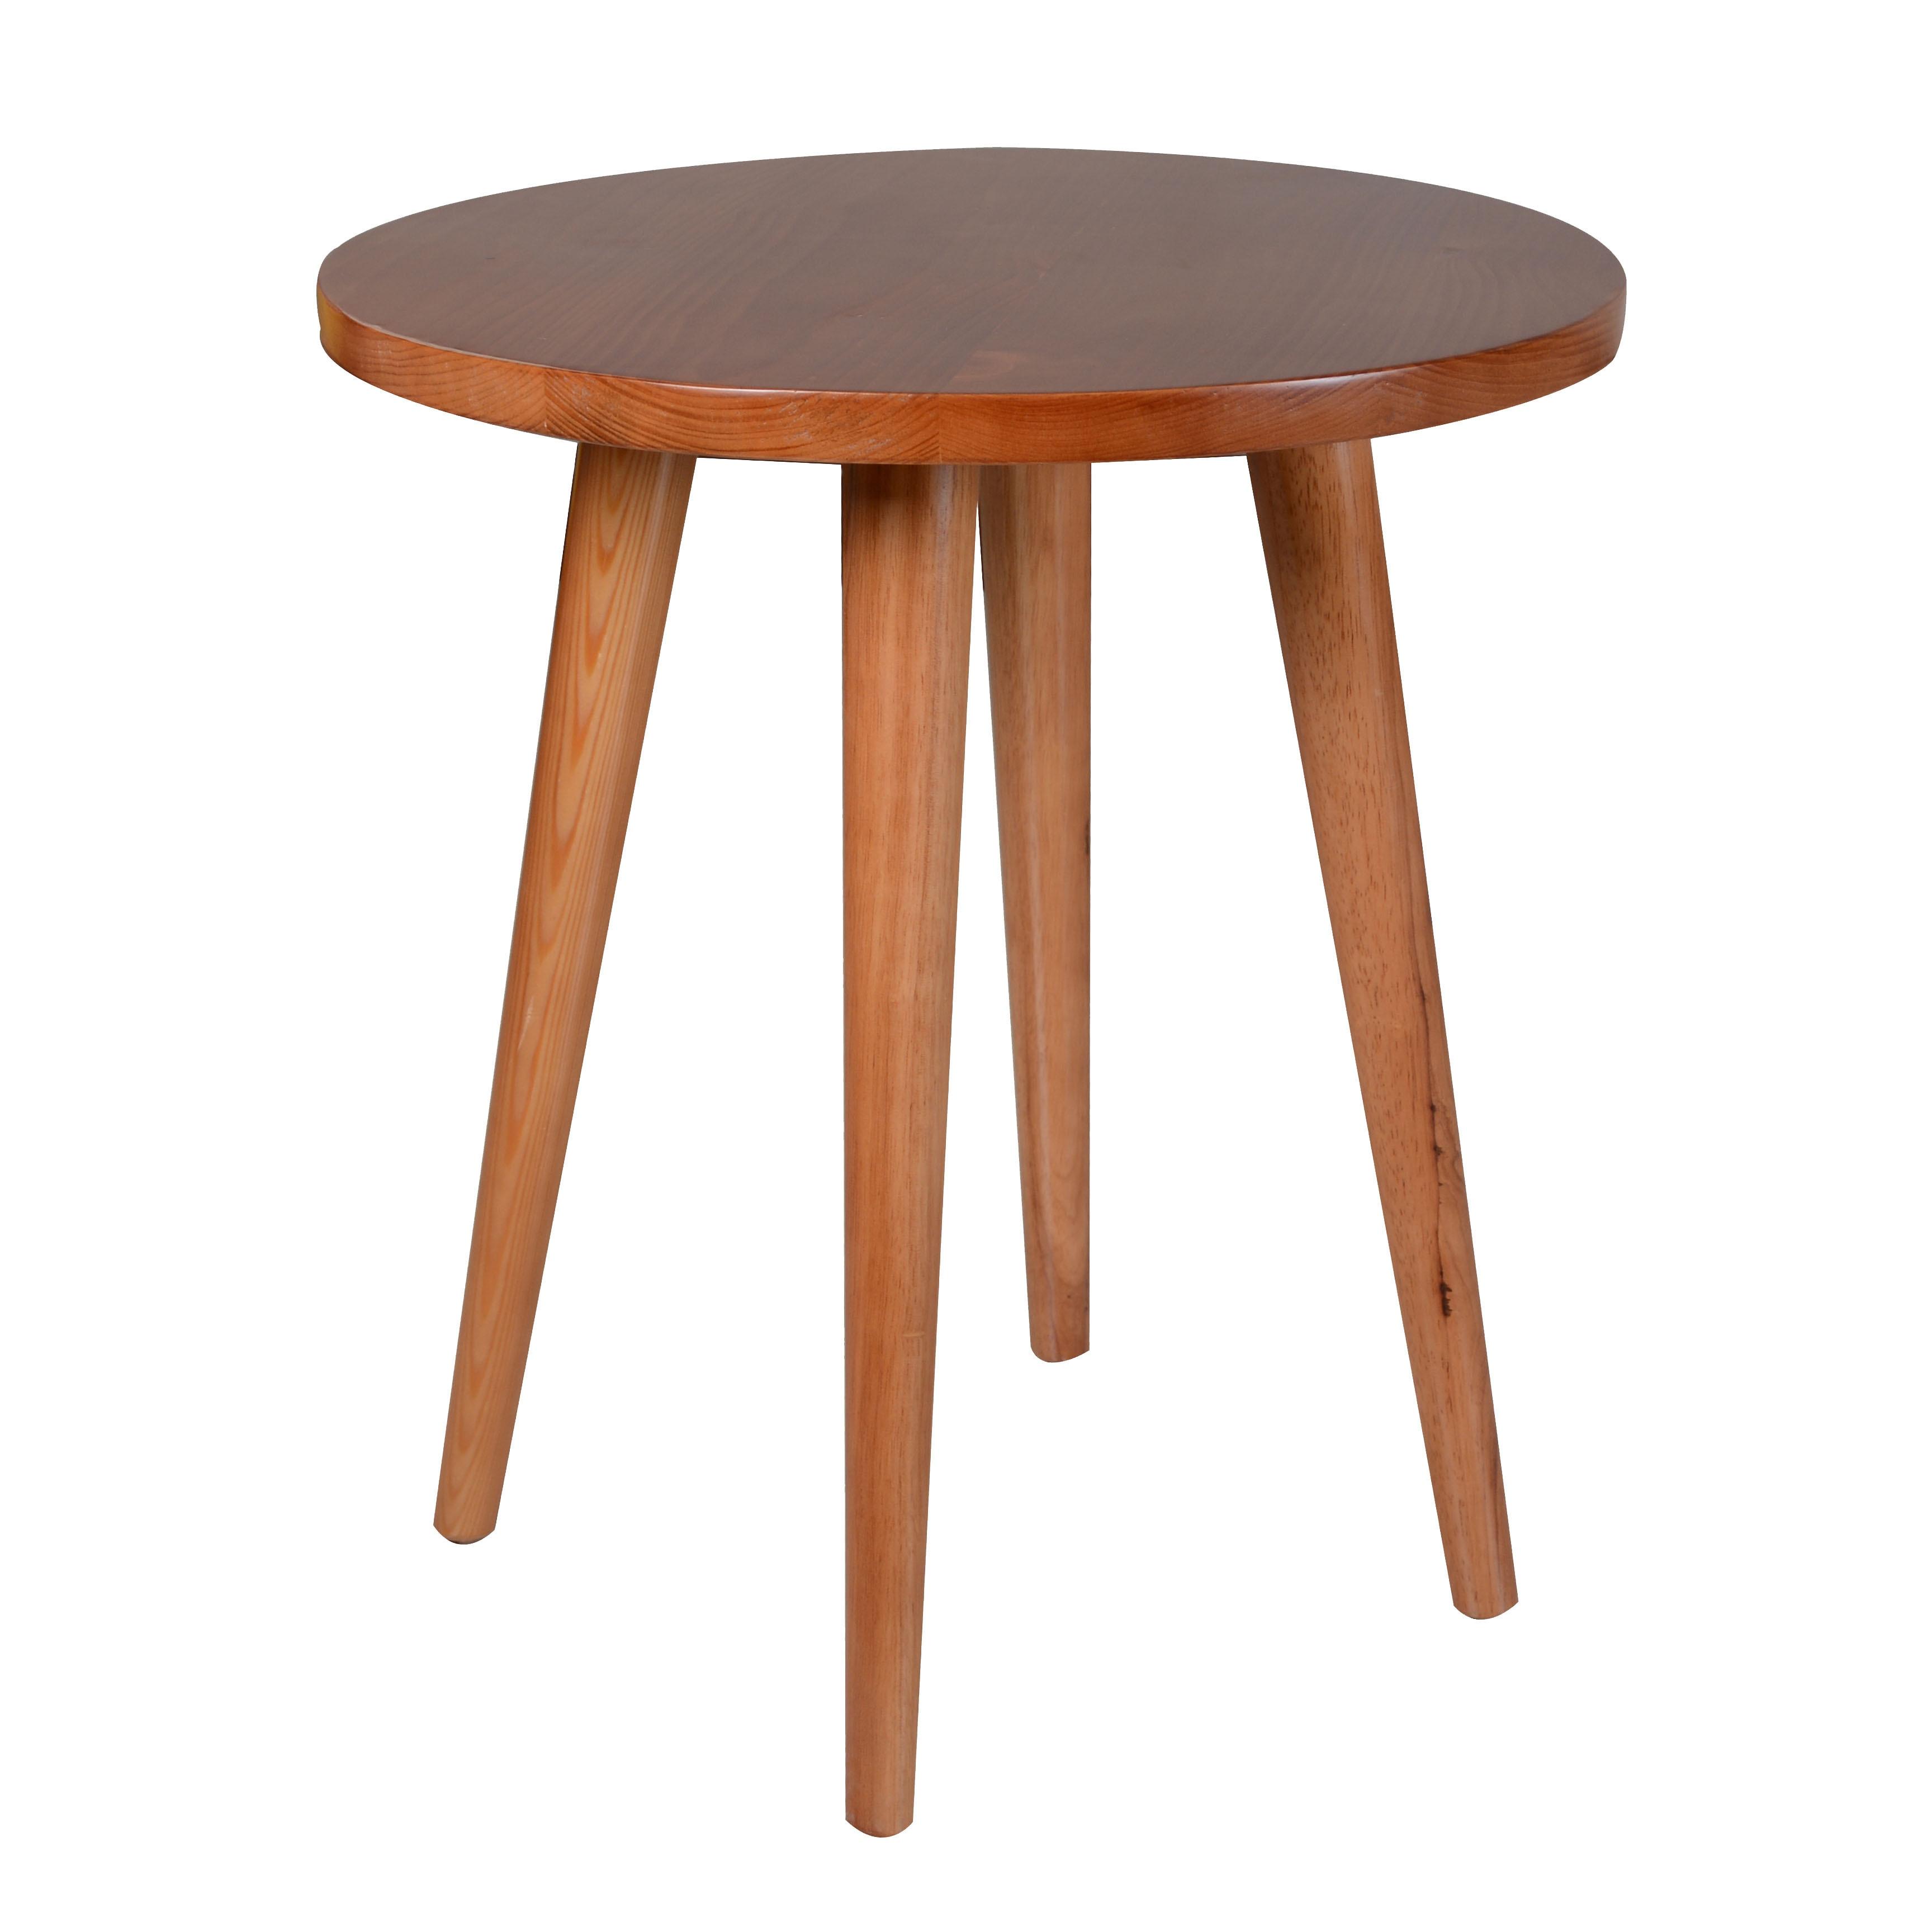 Porthos Home Ashton Side Table On Free Shipping Today 14514493